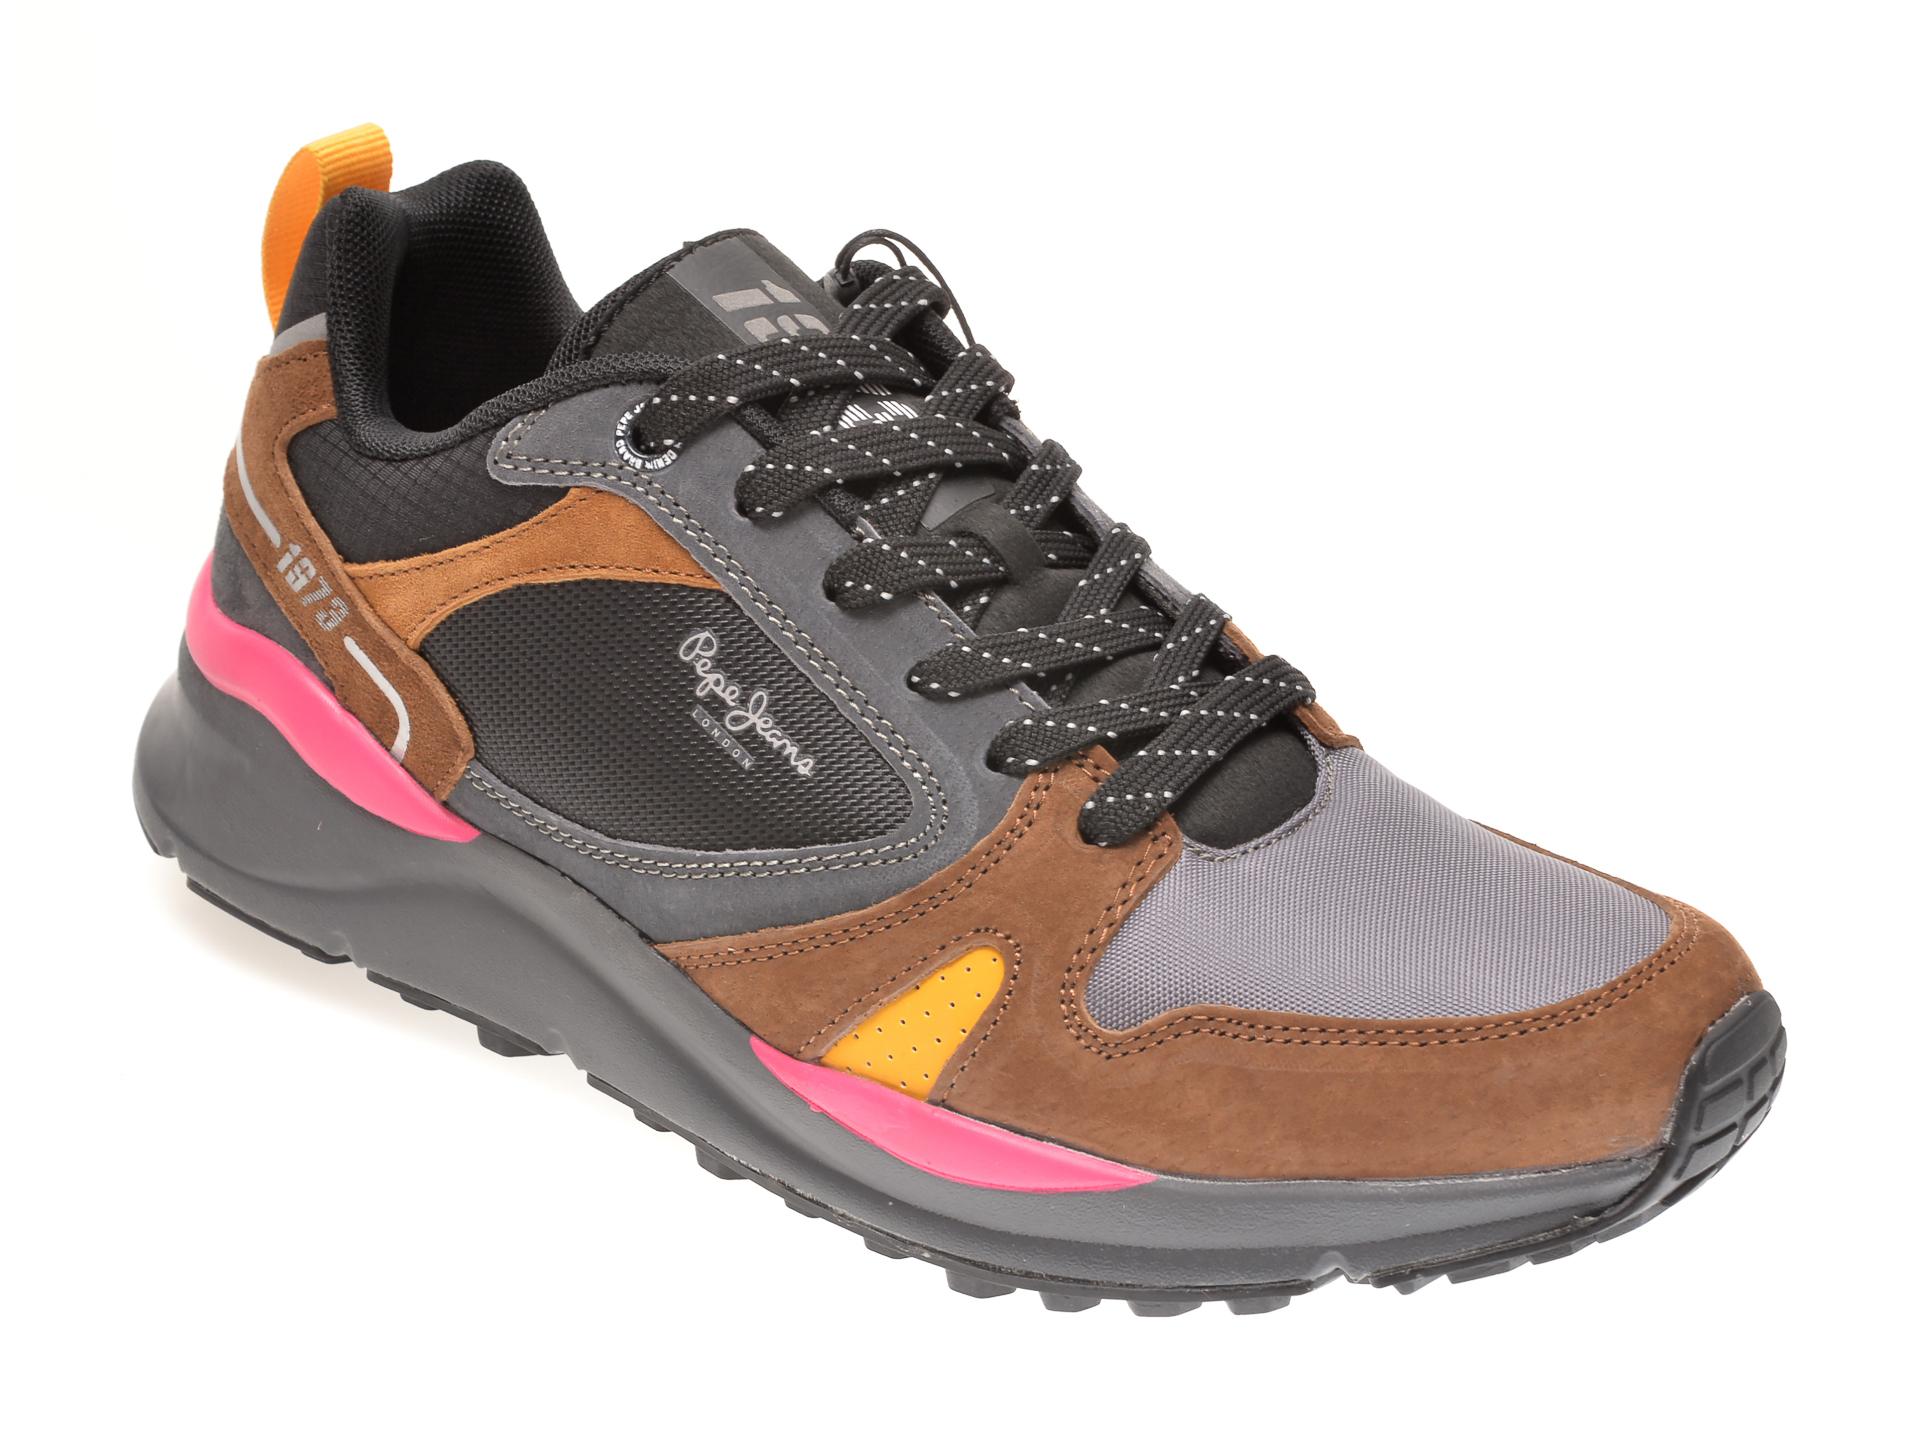 Pantofi sport PEPE JEANS maro, MS30679, din material textil si piele intoarsa